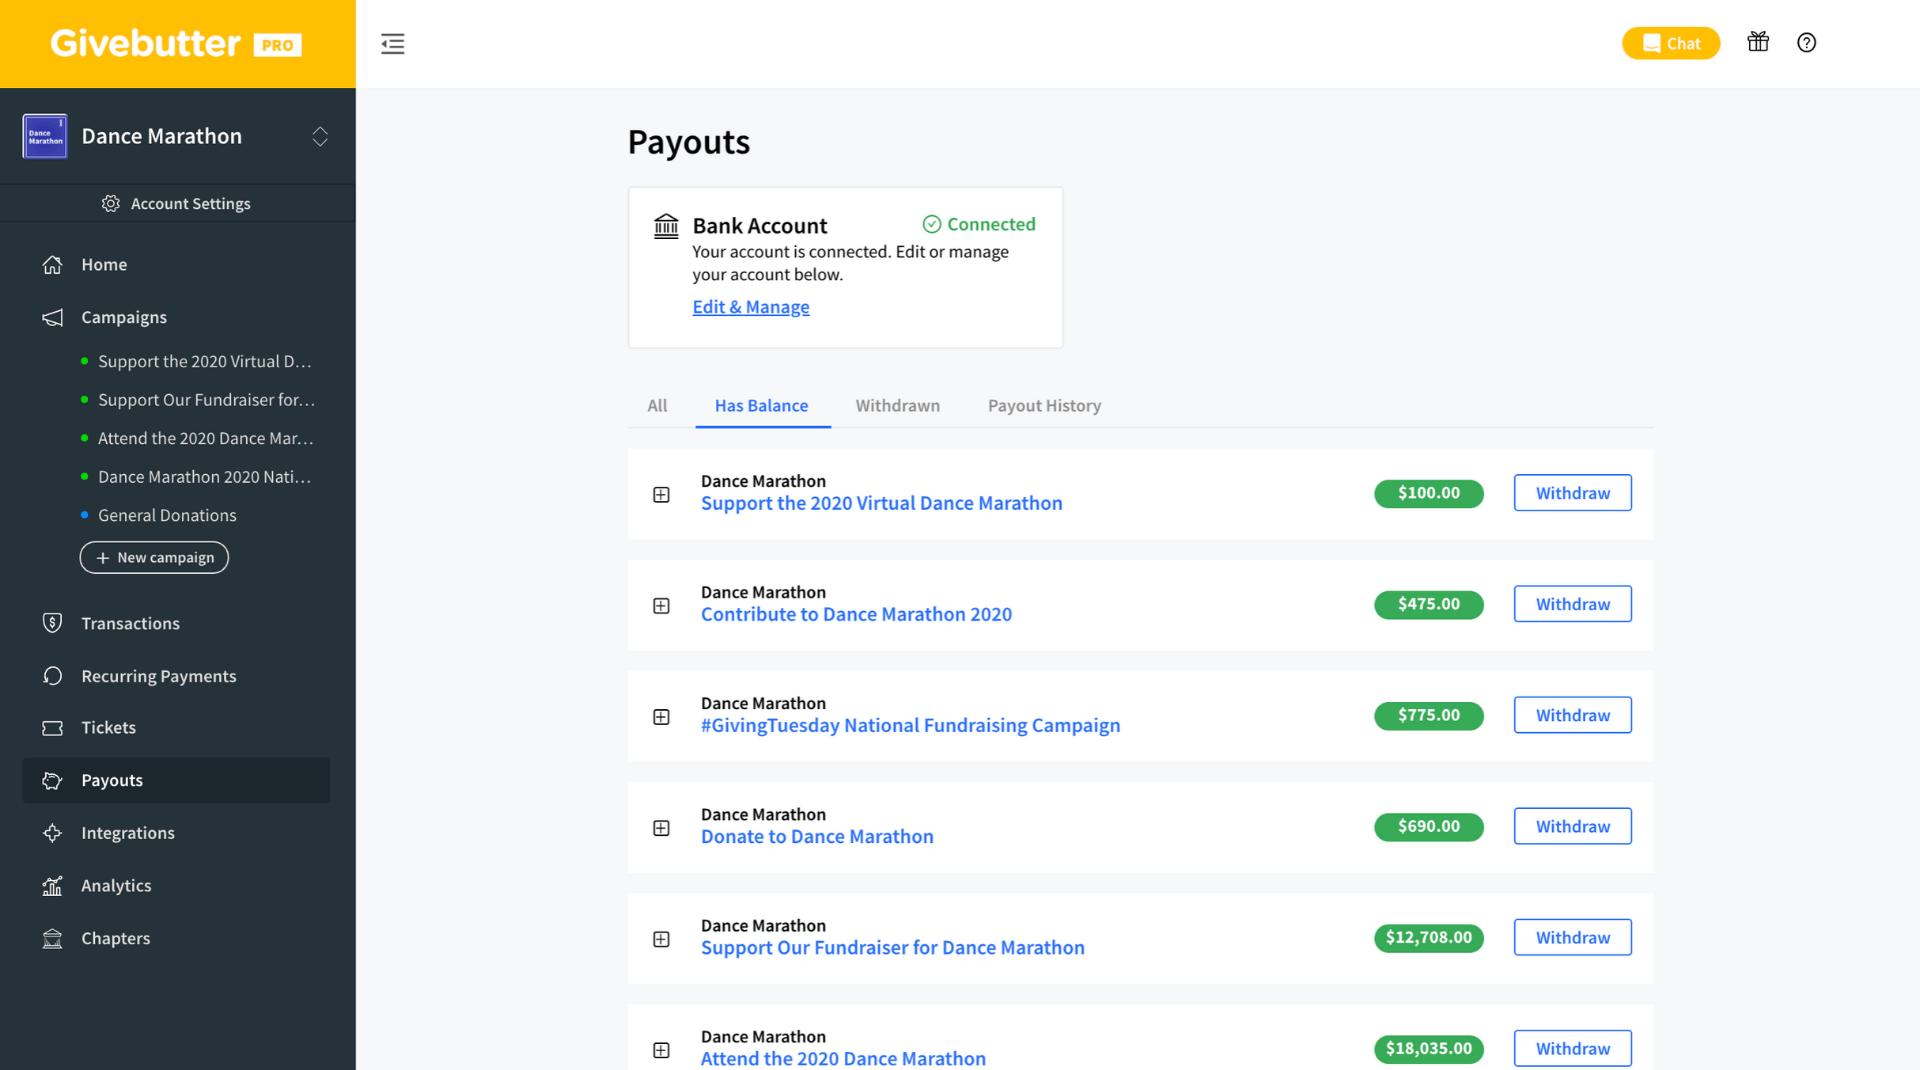 Givebutter Payouts Website Screenshot